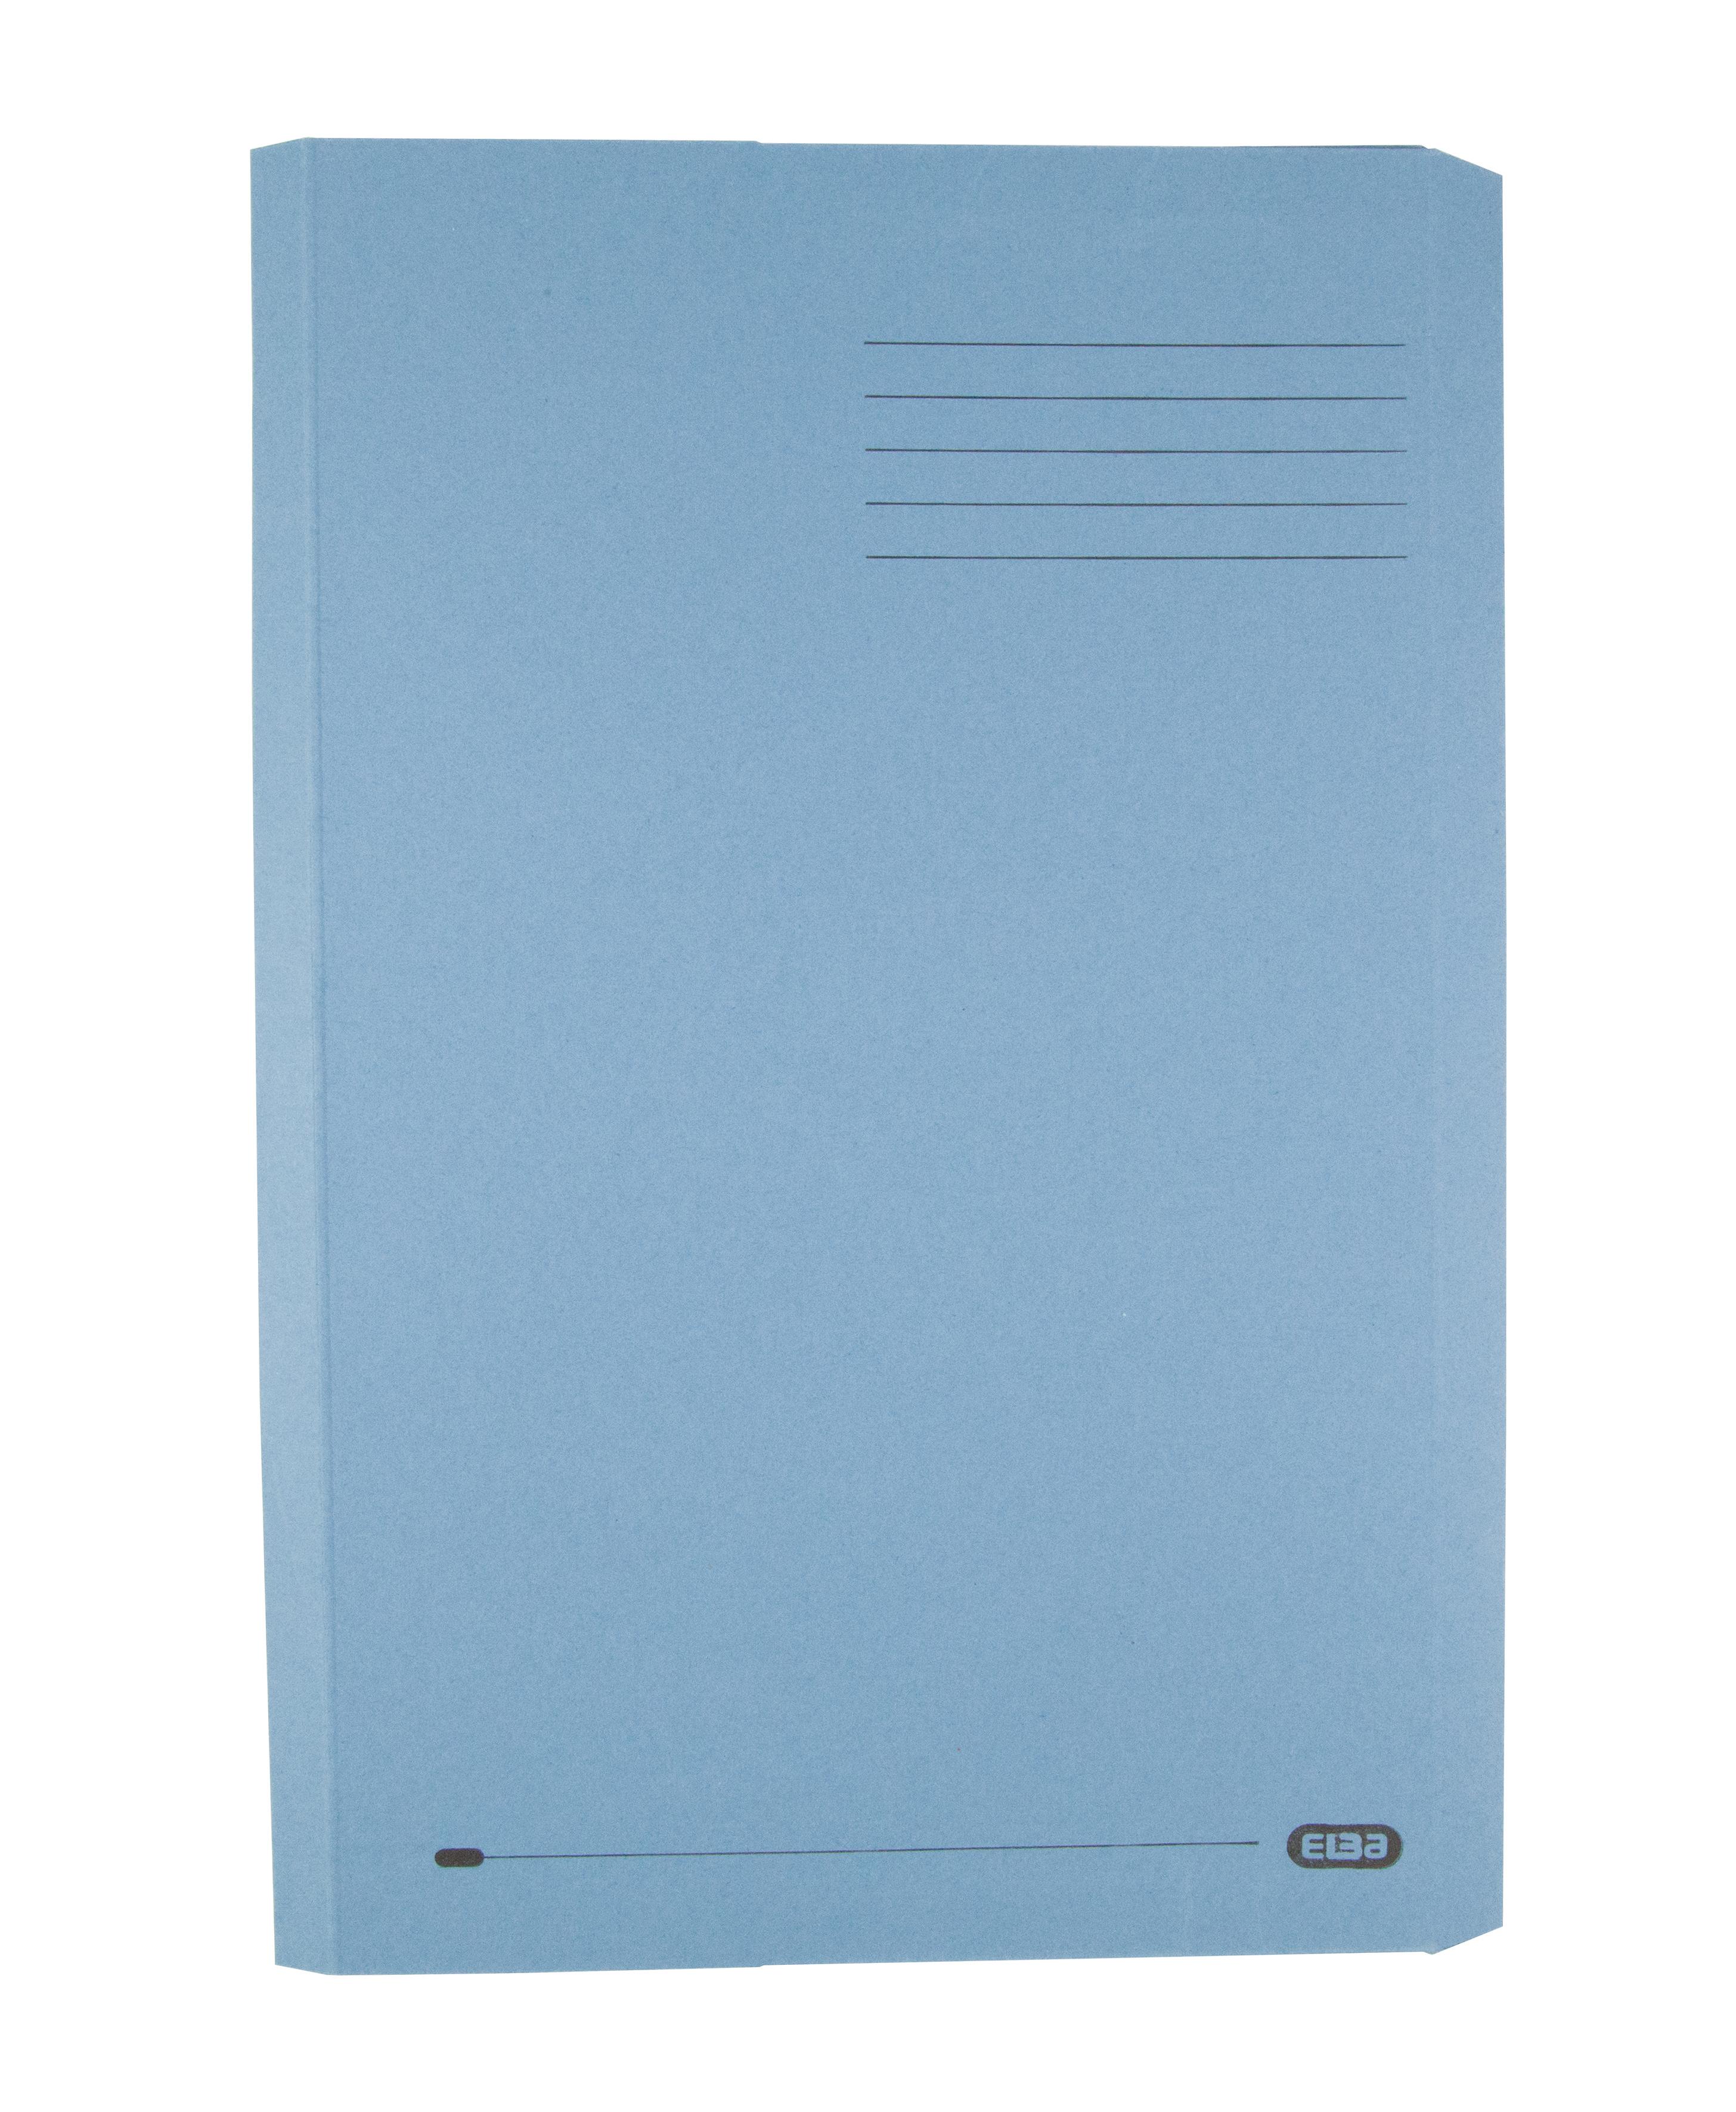 Elba Clifton Flat Bar Pocket (Rear) File 285gsm Capacity 50mm Foolscap Blue Ref 100090178 [Pack 25]